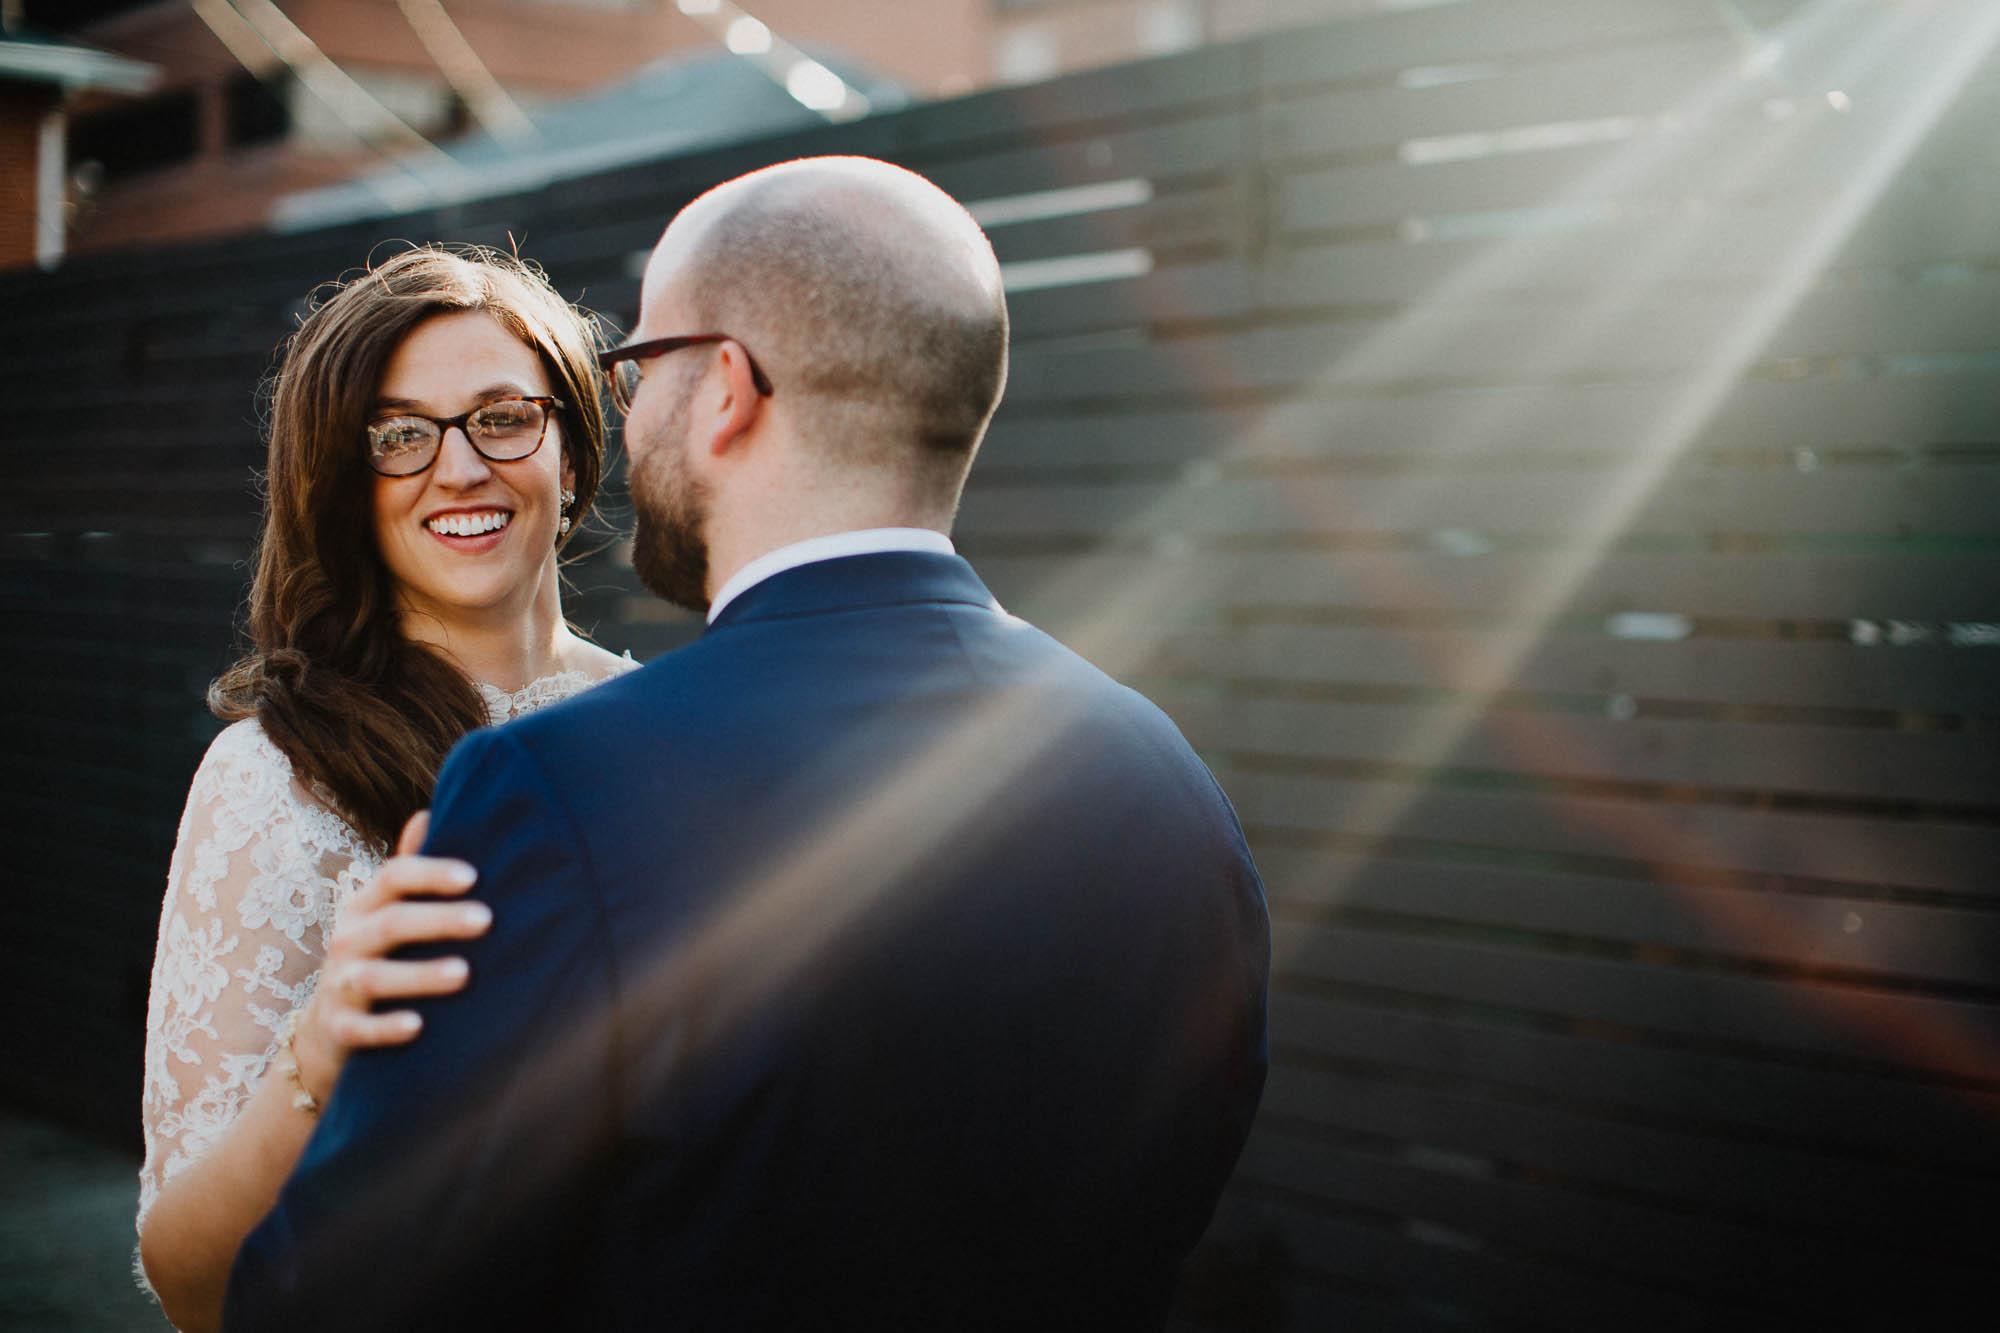 Highline-Car-House-Wedding-Columbus-Kristin-Aaron-053.jpg